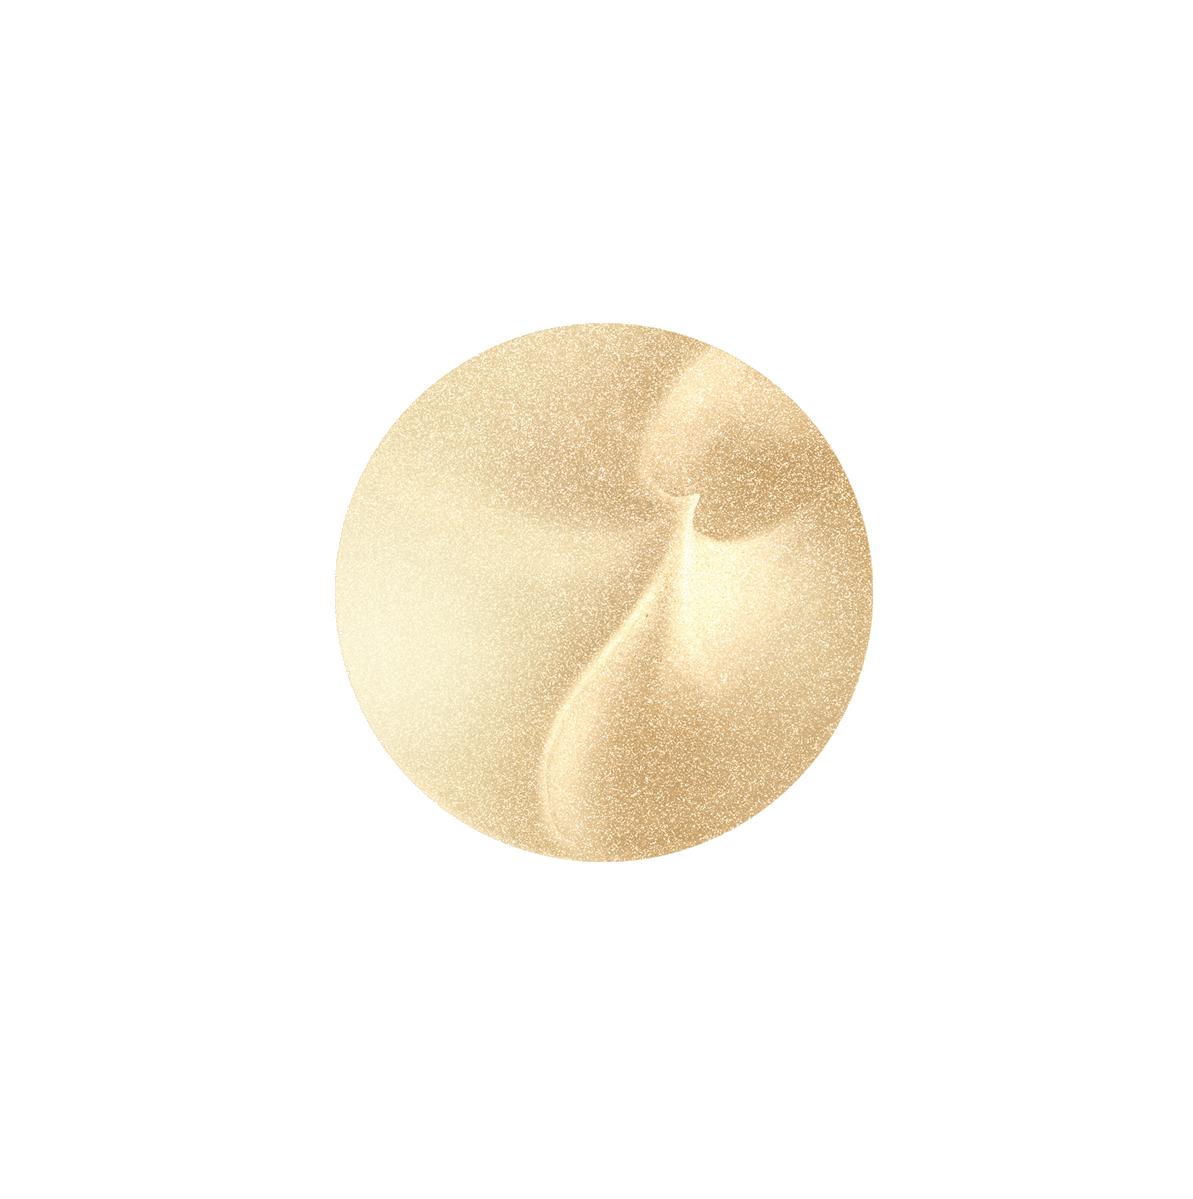 collab-fundamental-radiant-primer-swatch.png